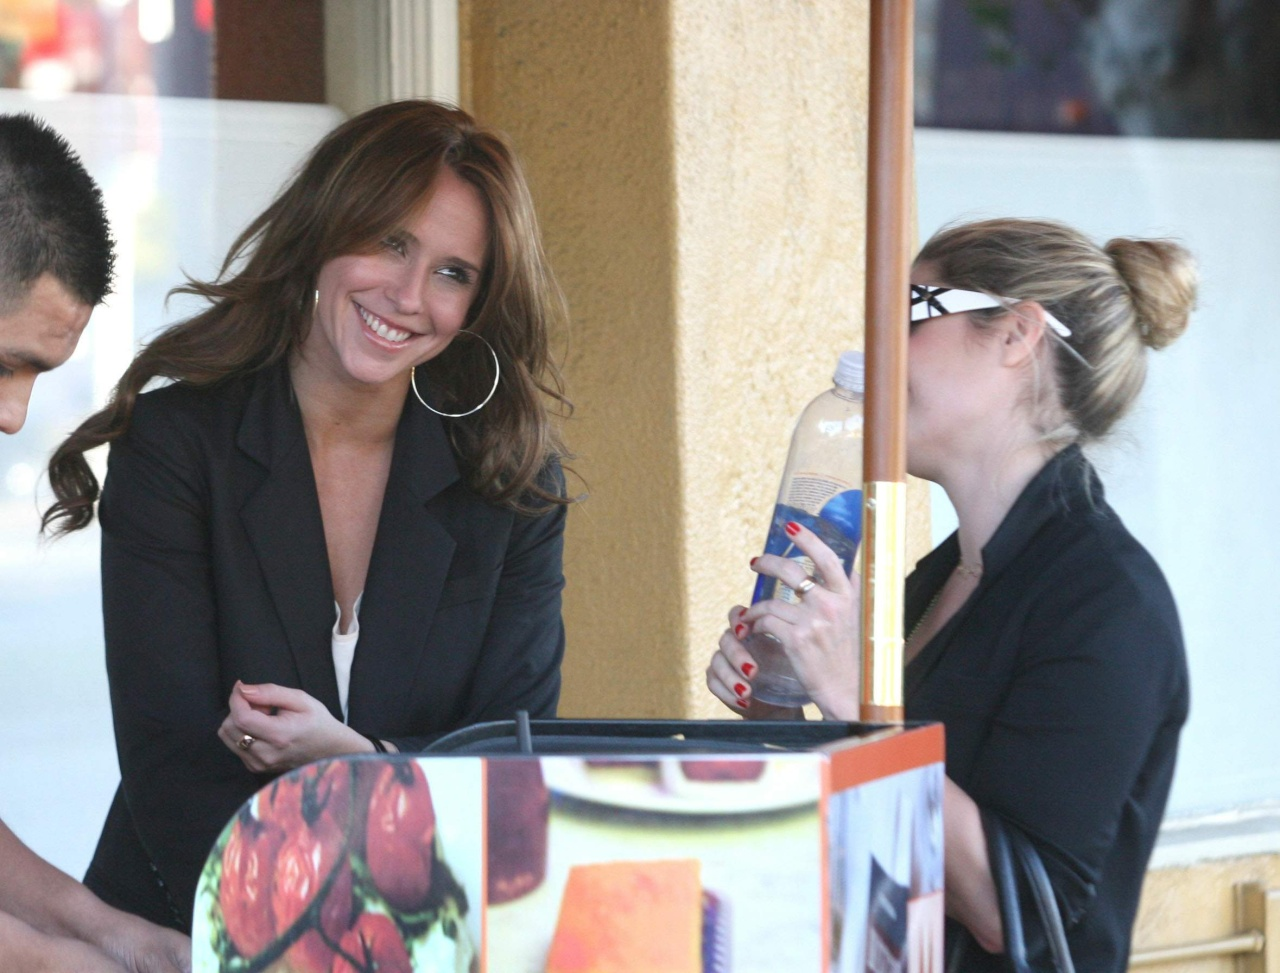 Jennifer Love Hewitt, Mozza Pizzeria Restaurant, West Hollywood 817